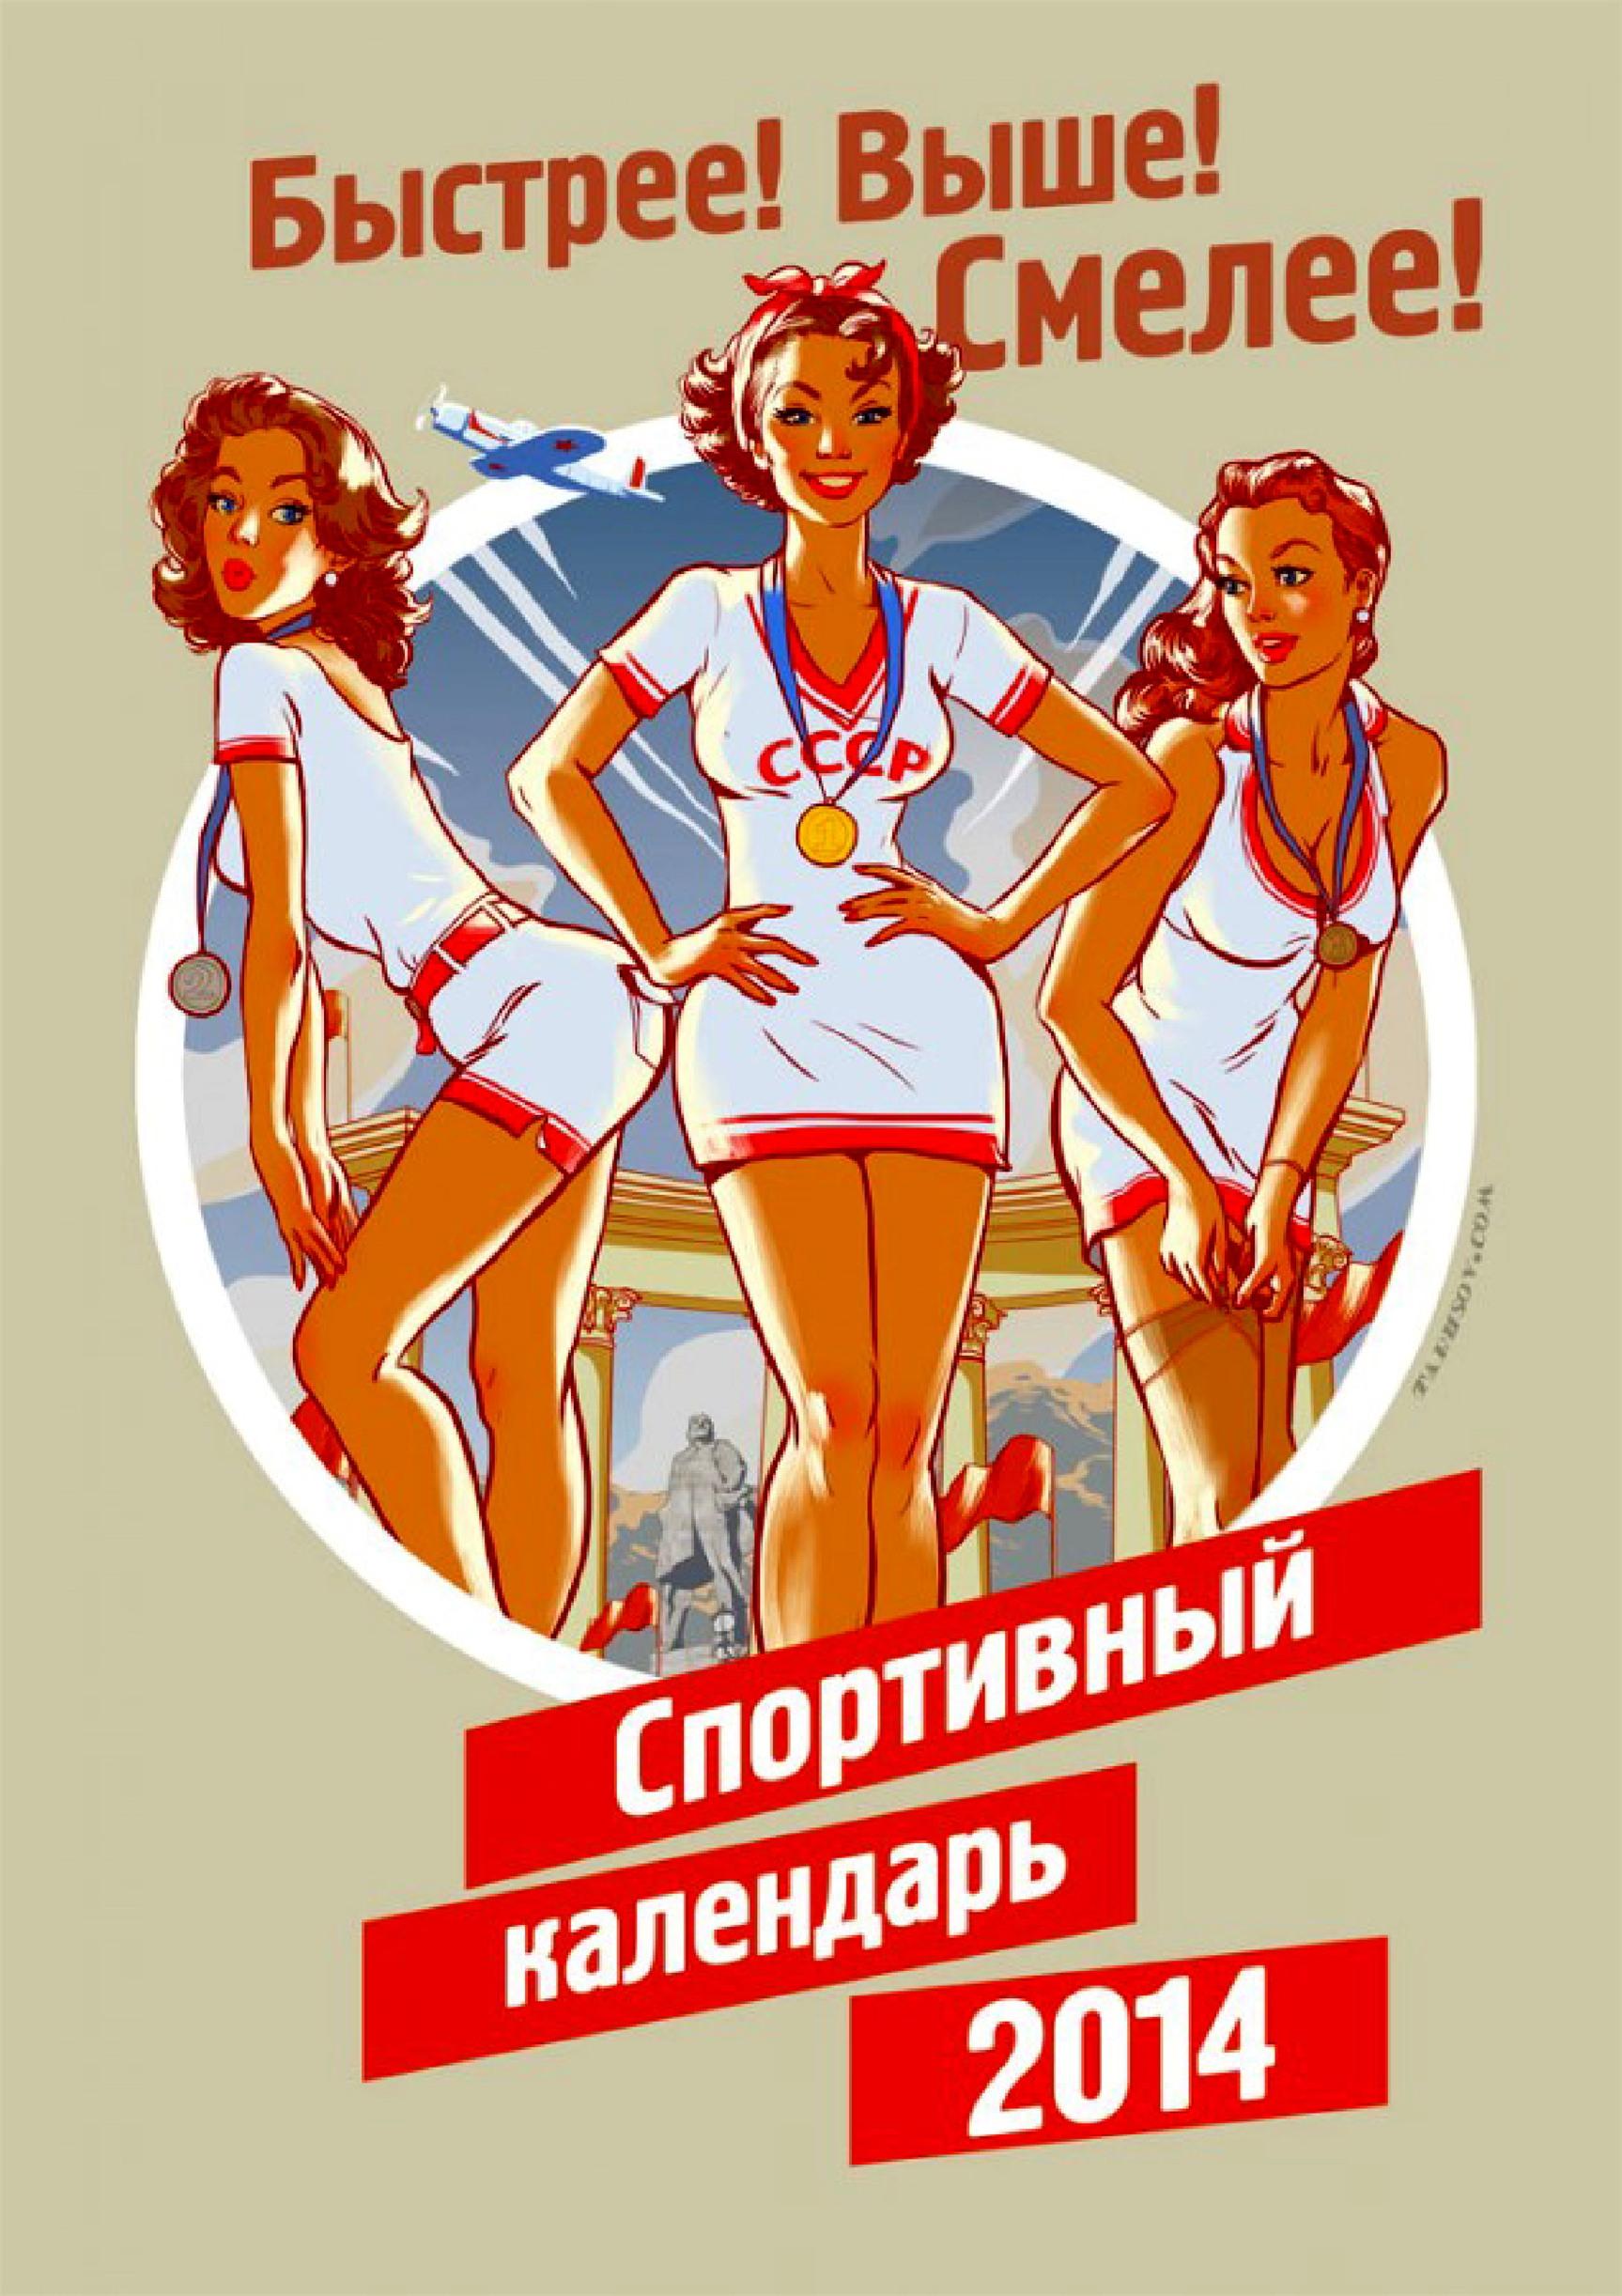 олимпийский пин-ап календарь на 2014 год / winter olympic 2014 calendar